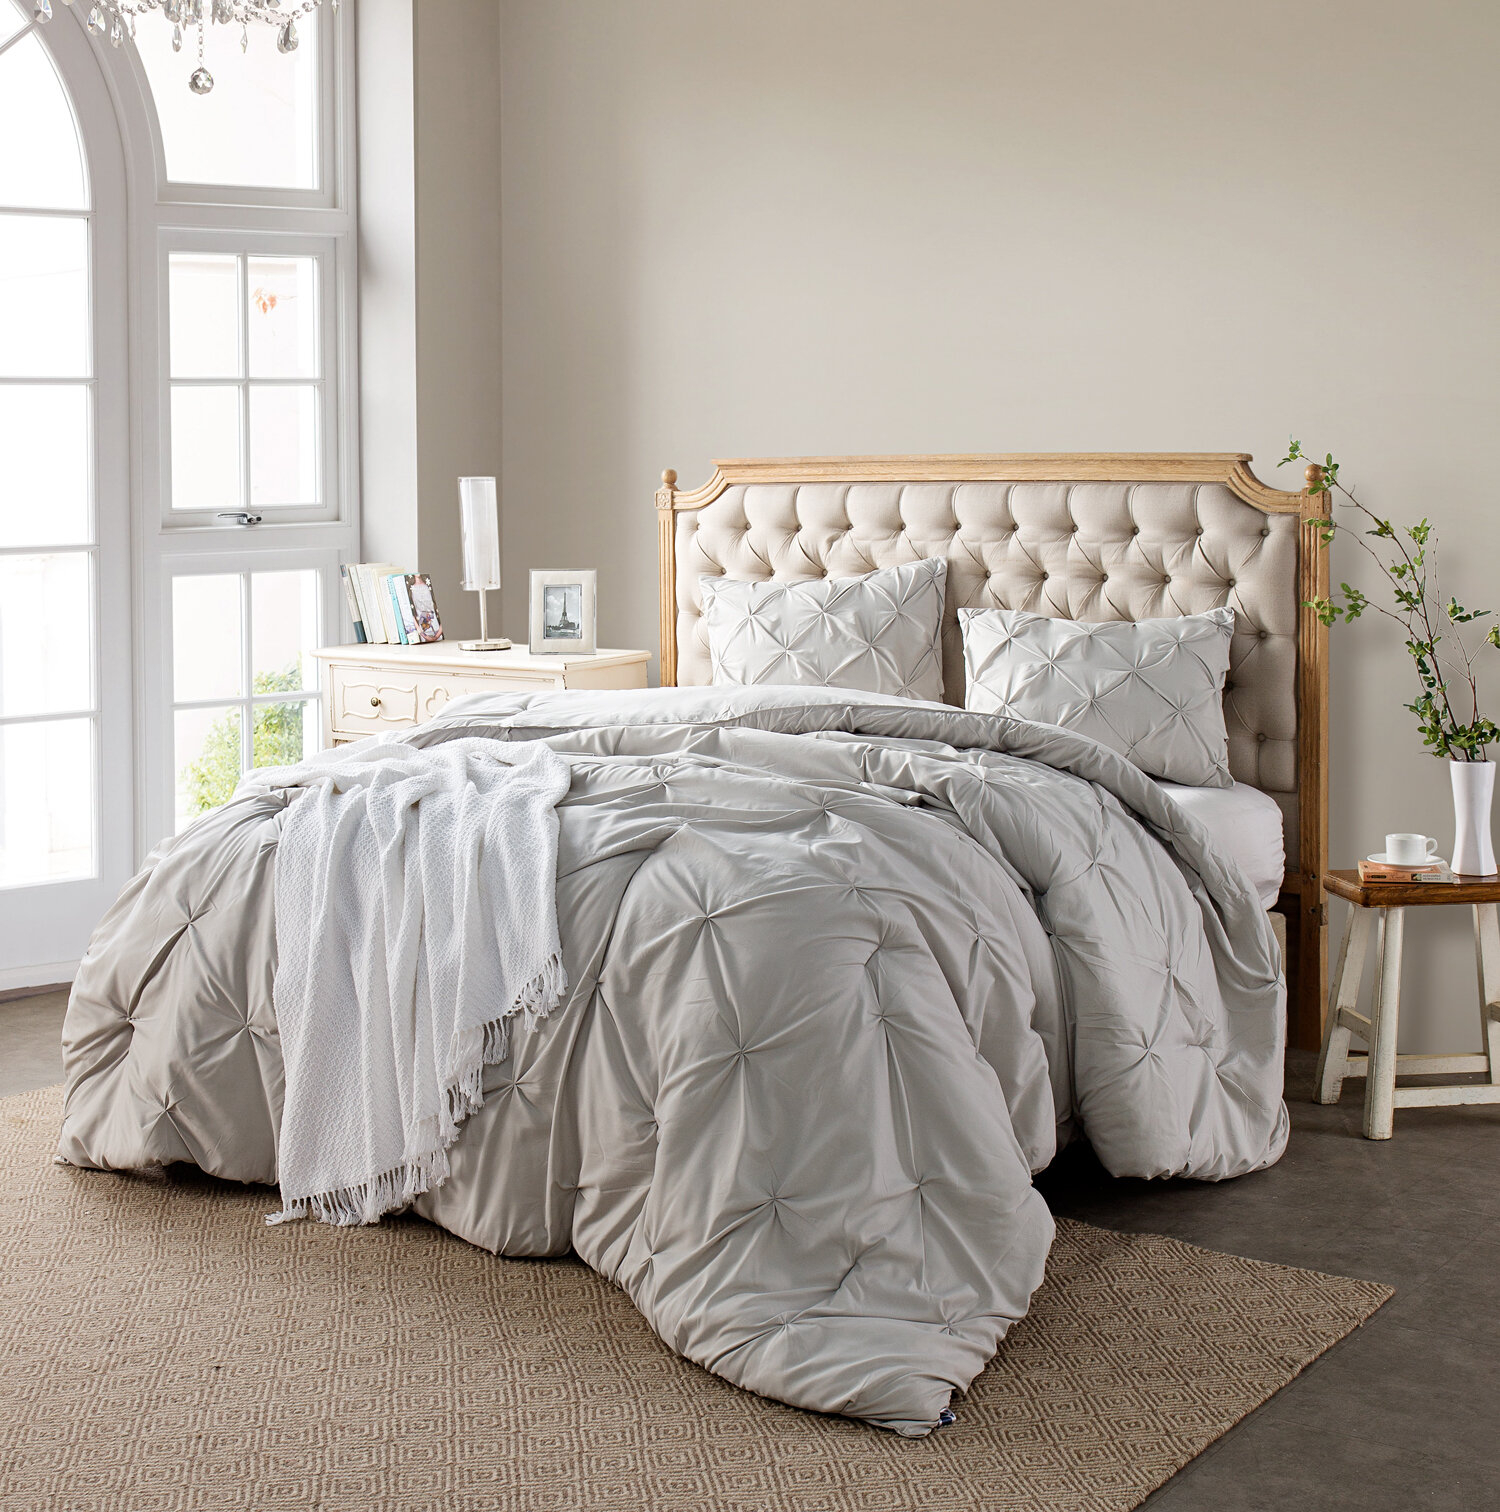 Oversized King Comforter Sets You Ll, Bedding Oversized Comforter Sets